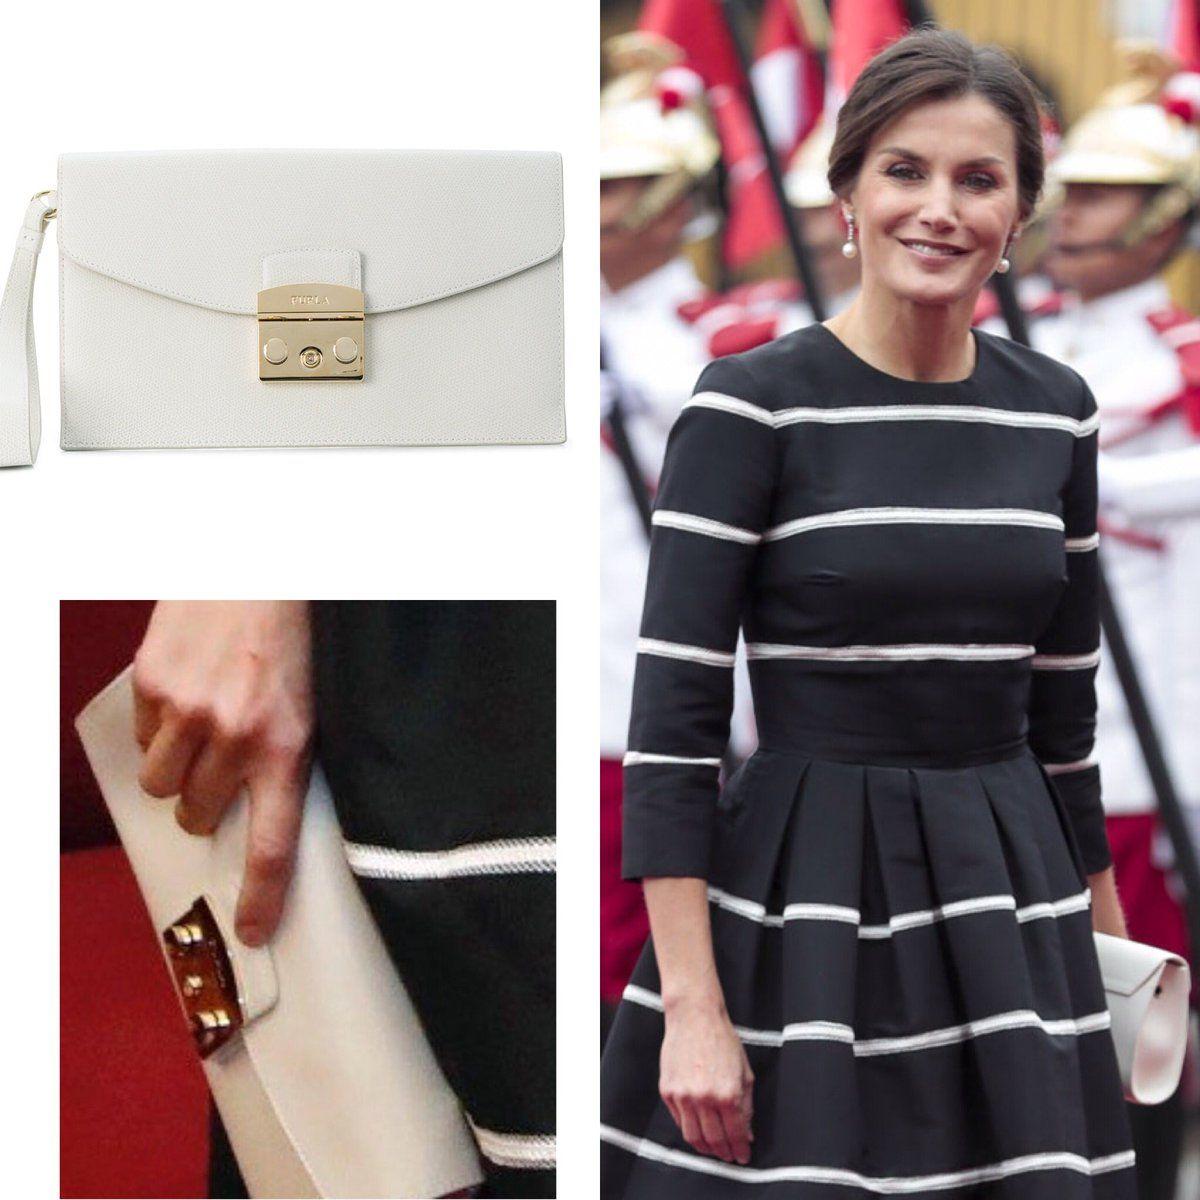 80s wedding decorations november 2018 November   King Felipe and Queen Letizia receive an official